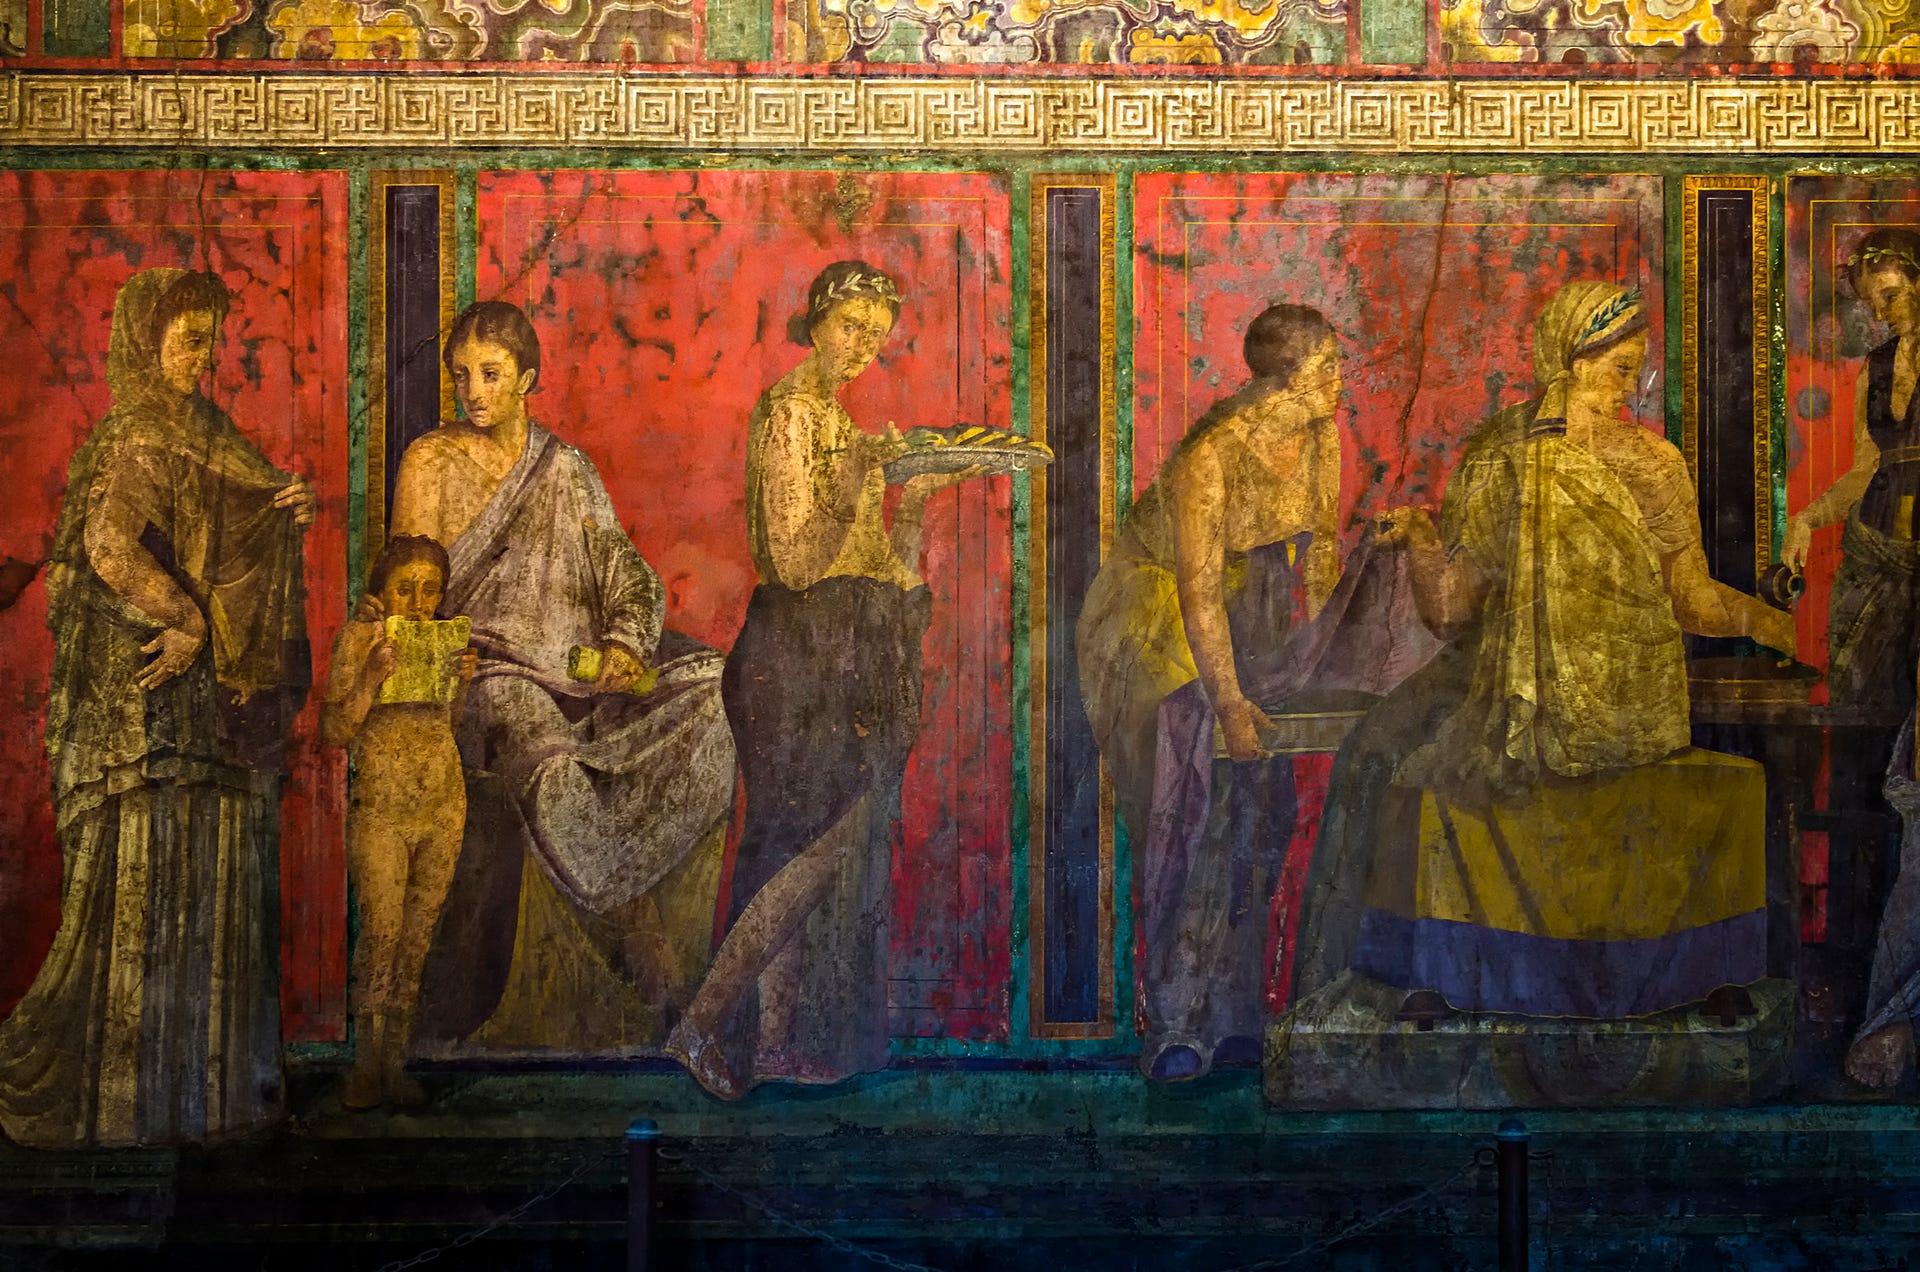 Pompeii: A photo tour of the ancient city